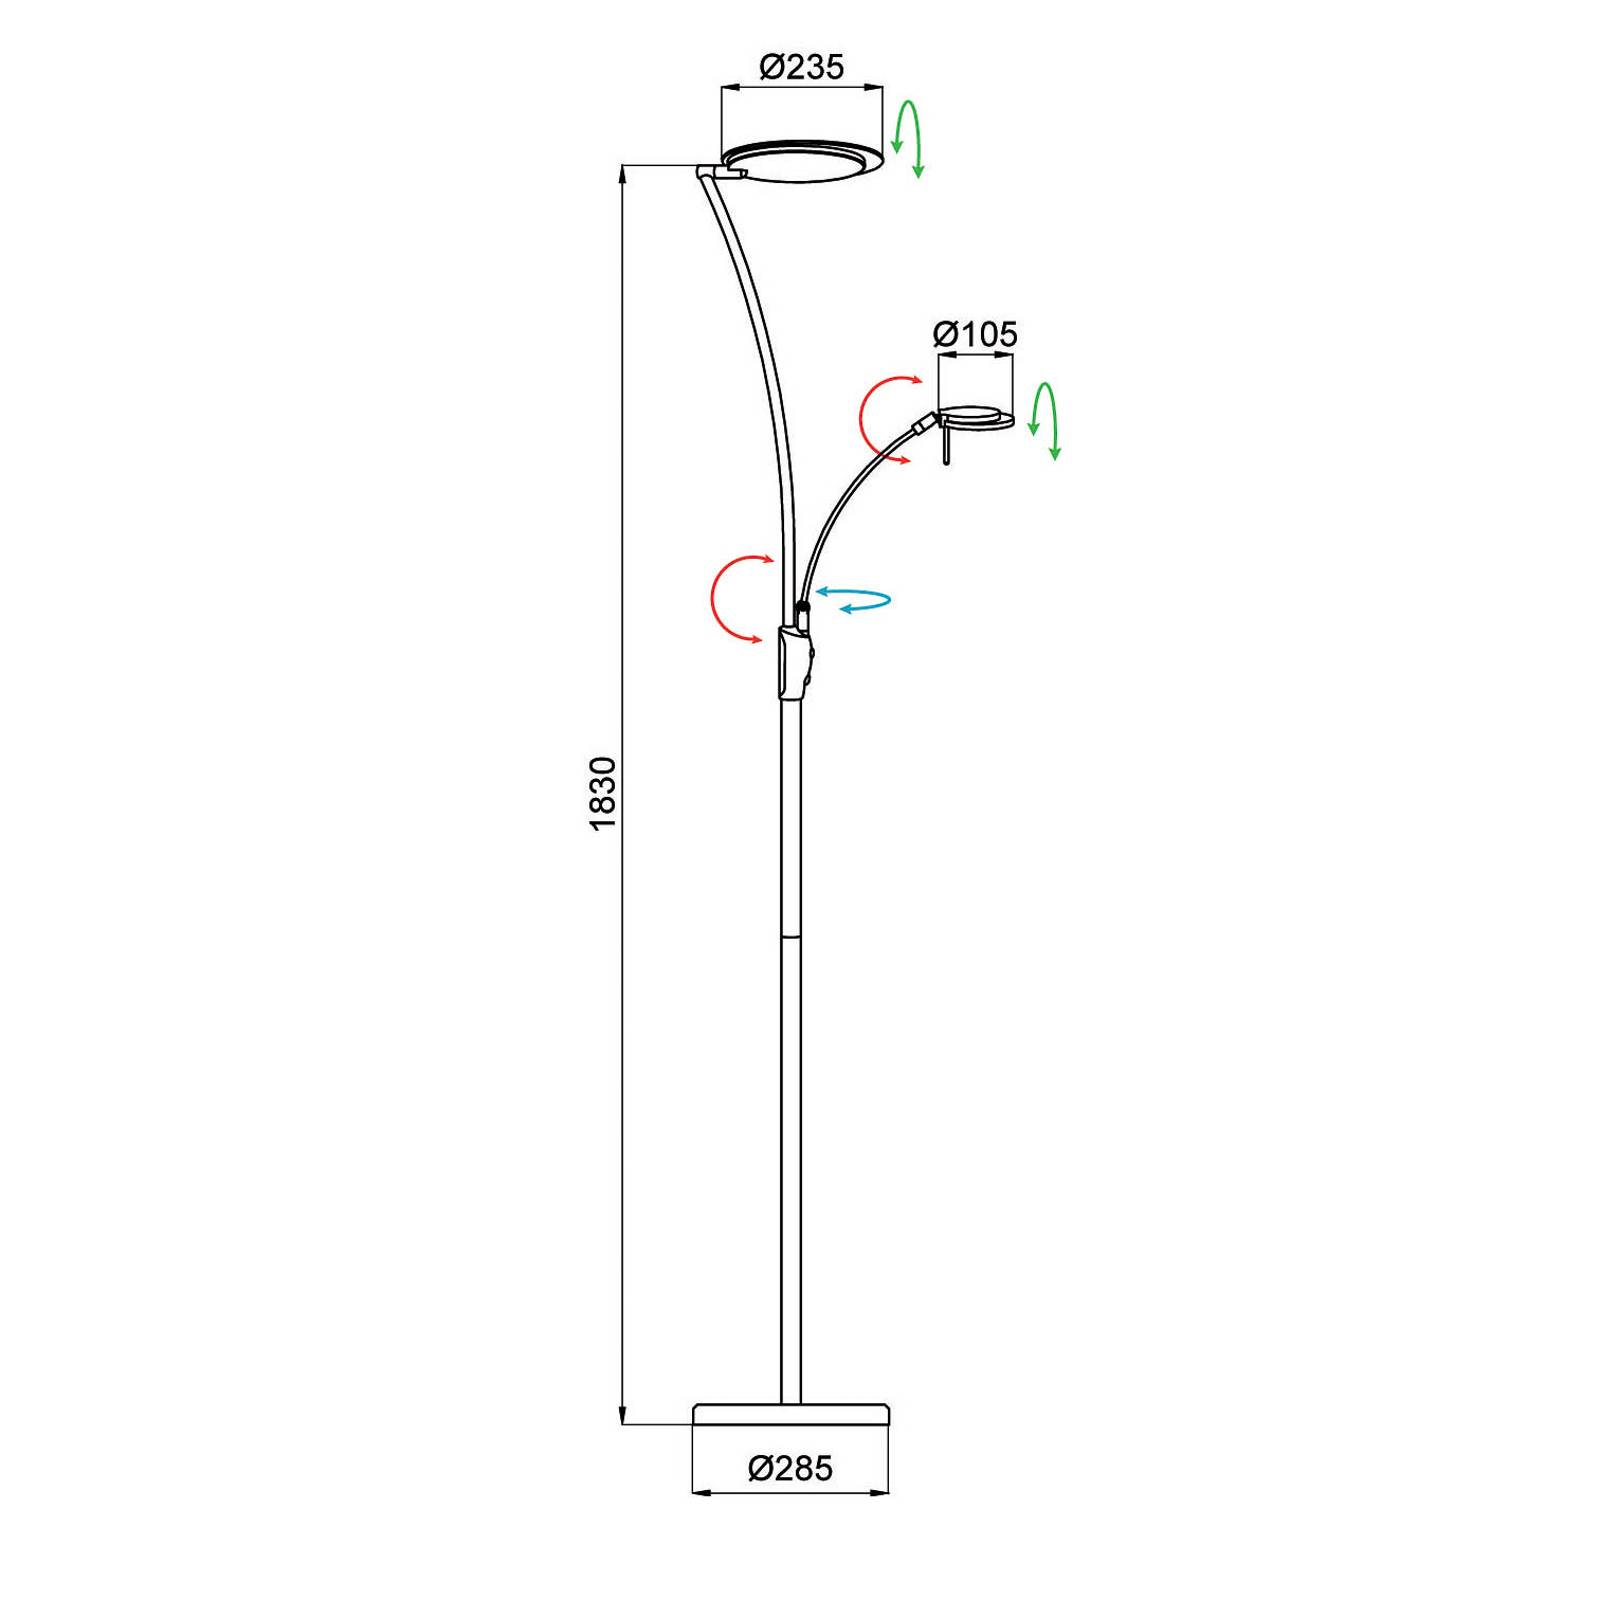 Aluminor Kitel 89 -LED-lattiavalo LED-lukuvalolla